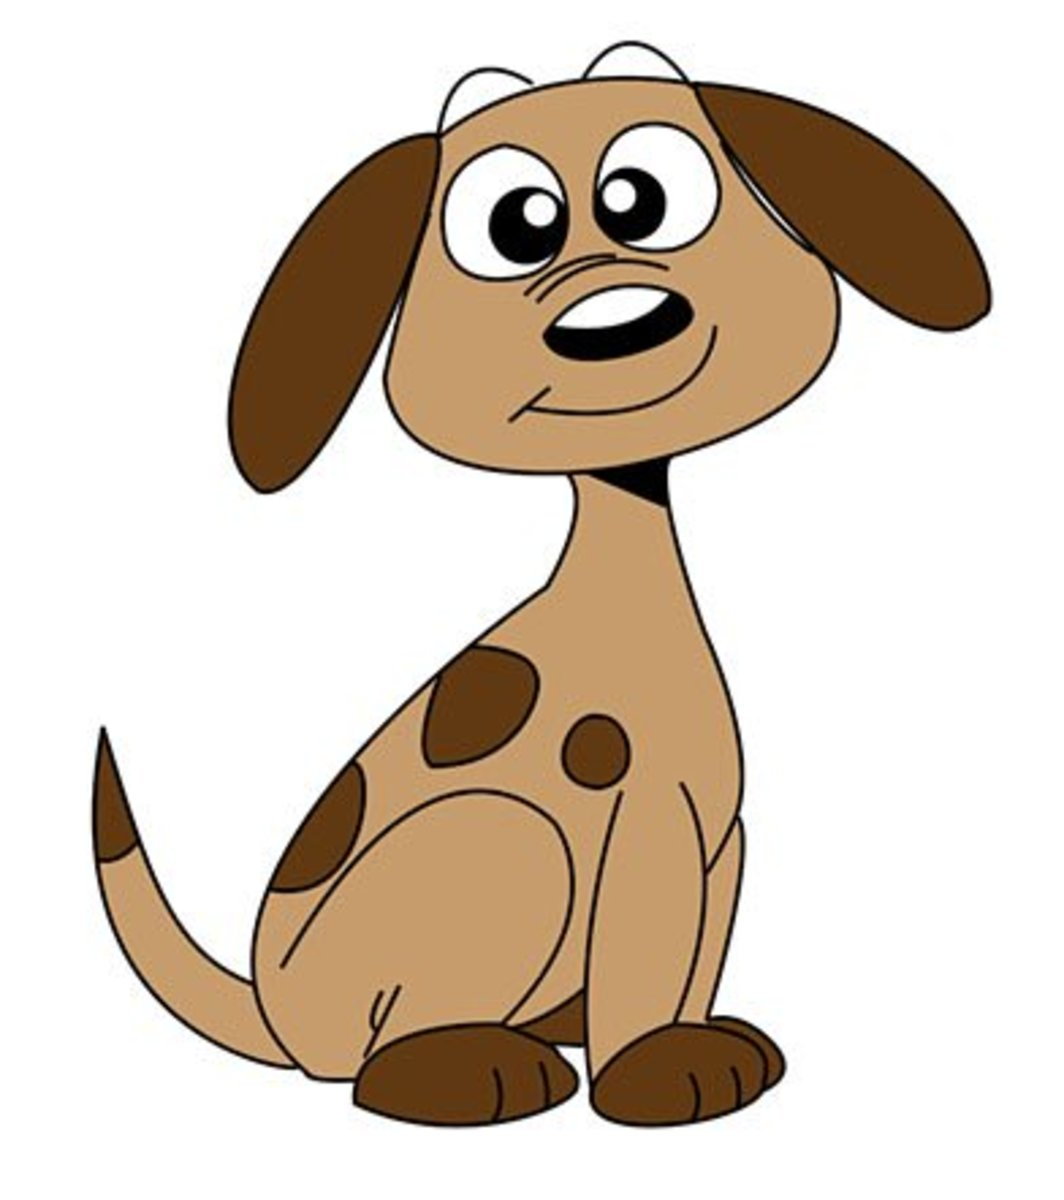 drawing-a-cartoon-dog